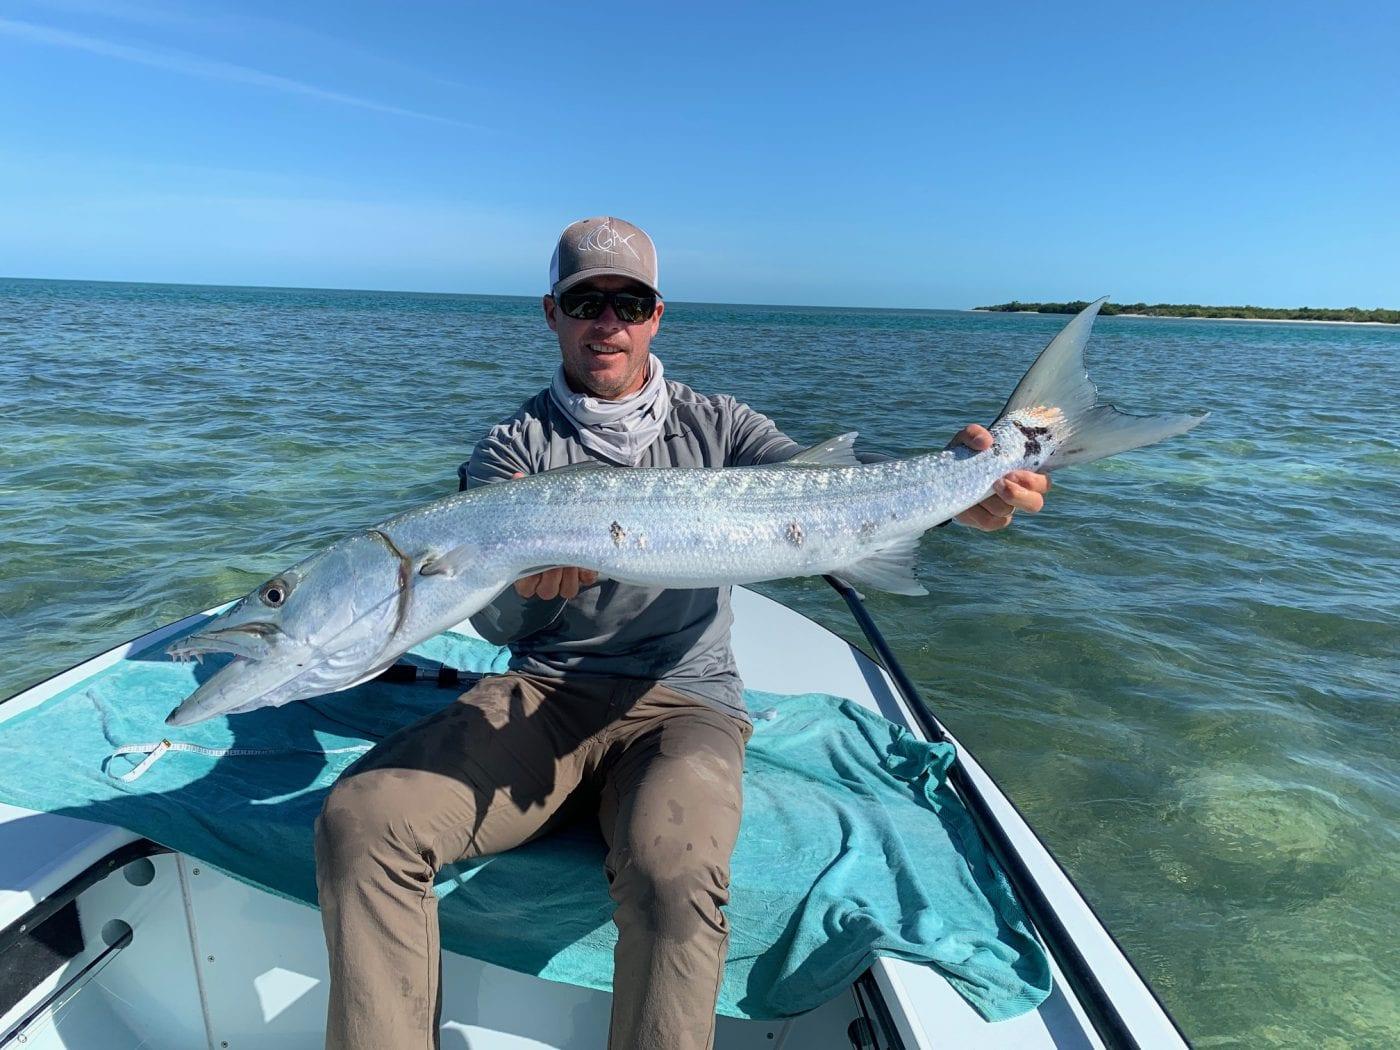 More barracuda, giants. Photo/guiding Ian Slater